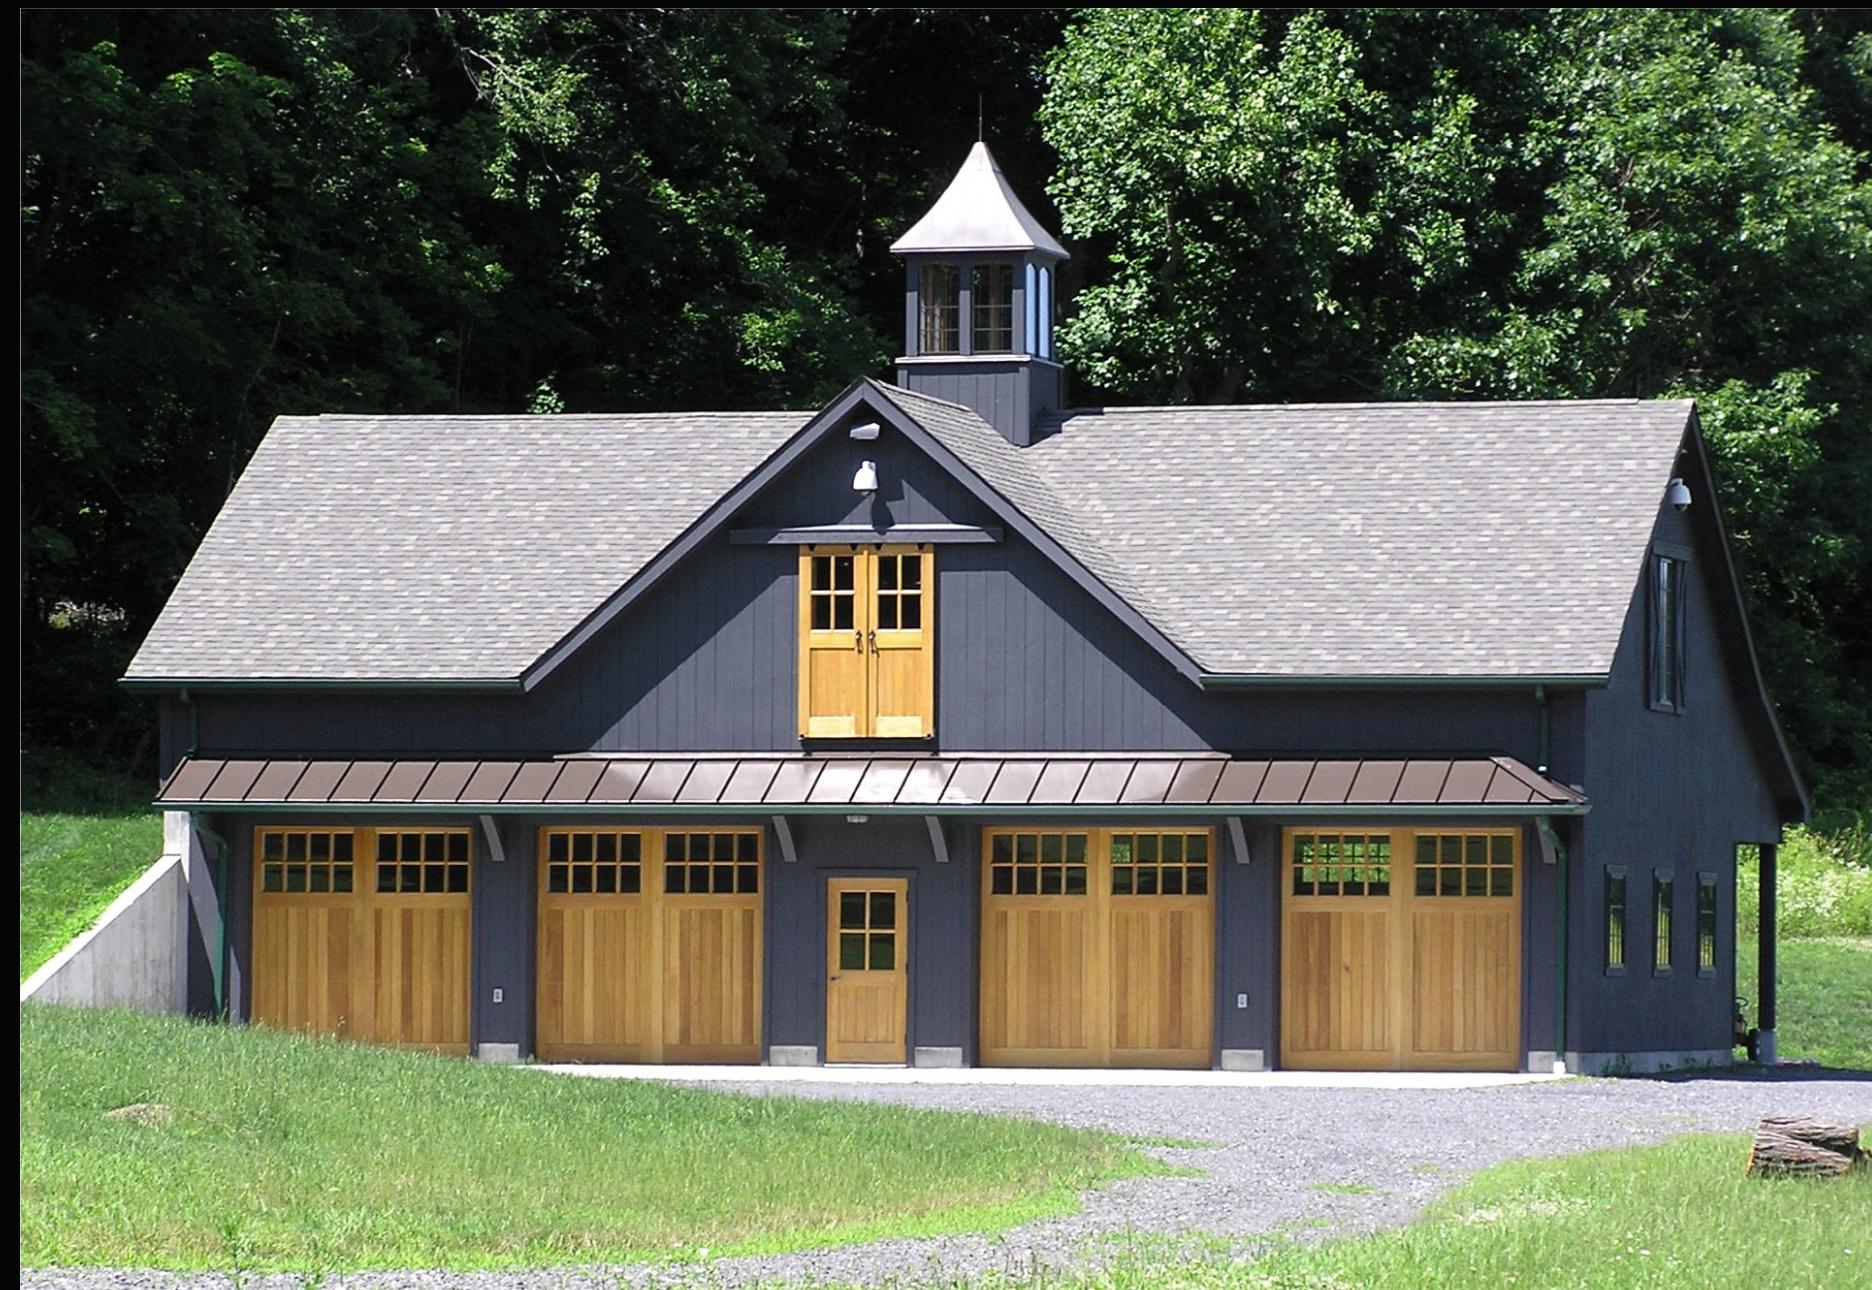 Amazing garage doors modern garagedoorsmodern in 2022